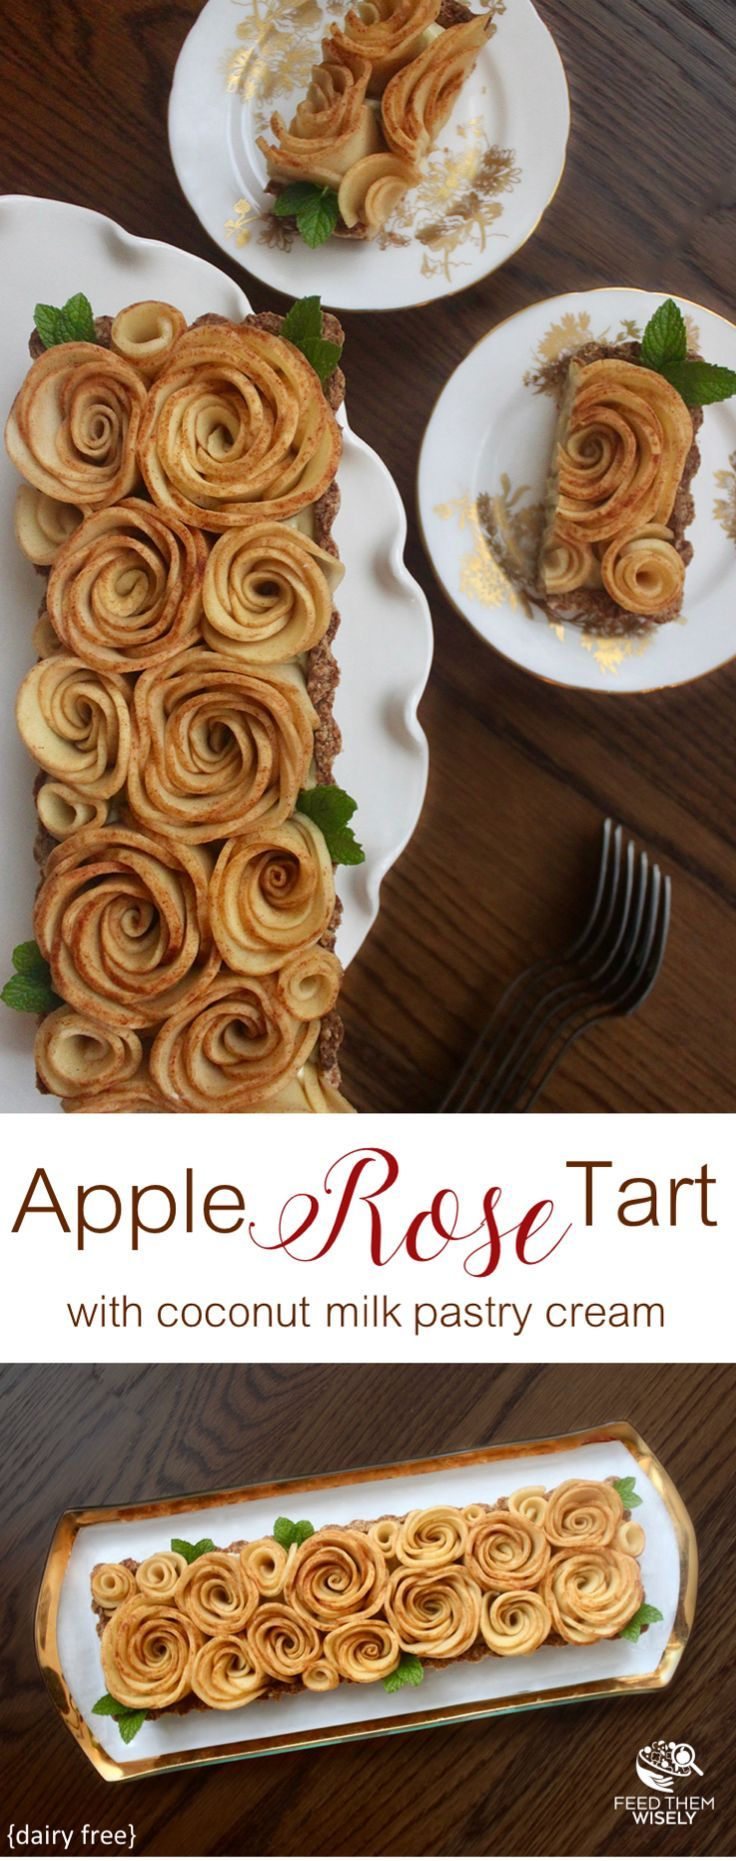 Apple Rose Tart | Posted By: DebbieNet.com